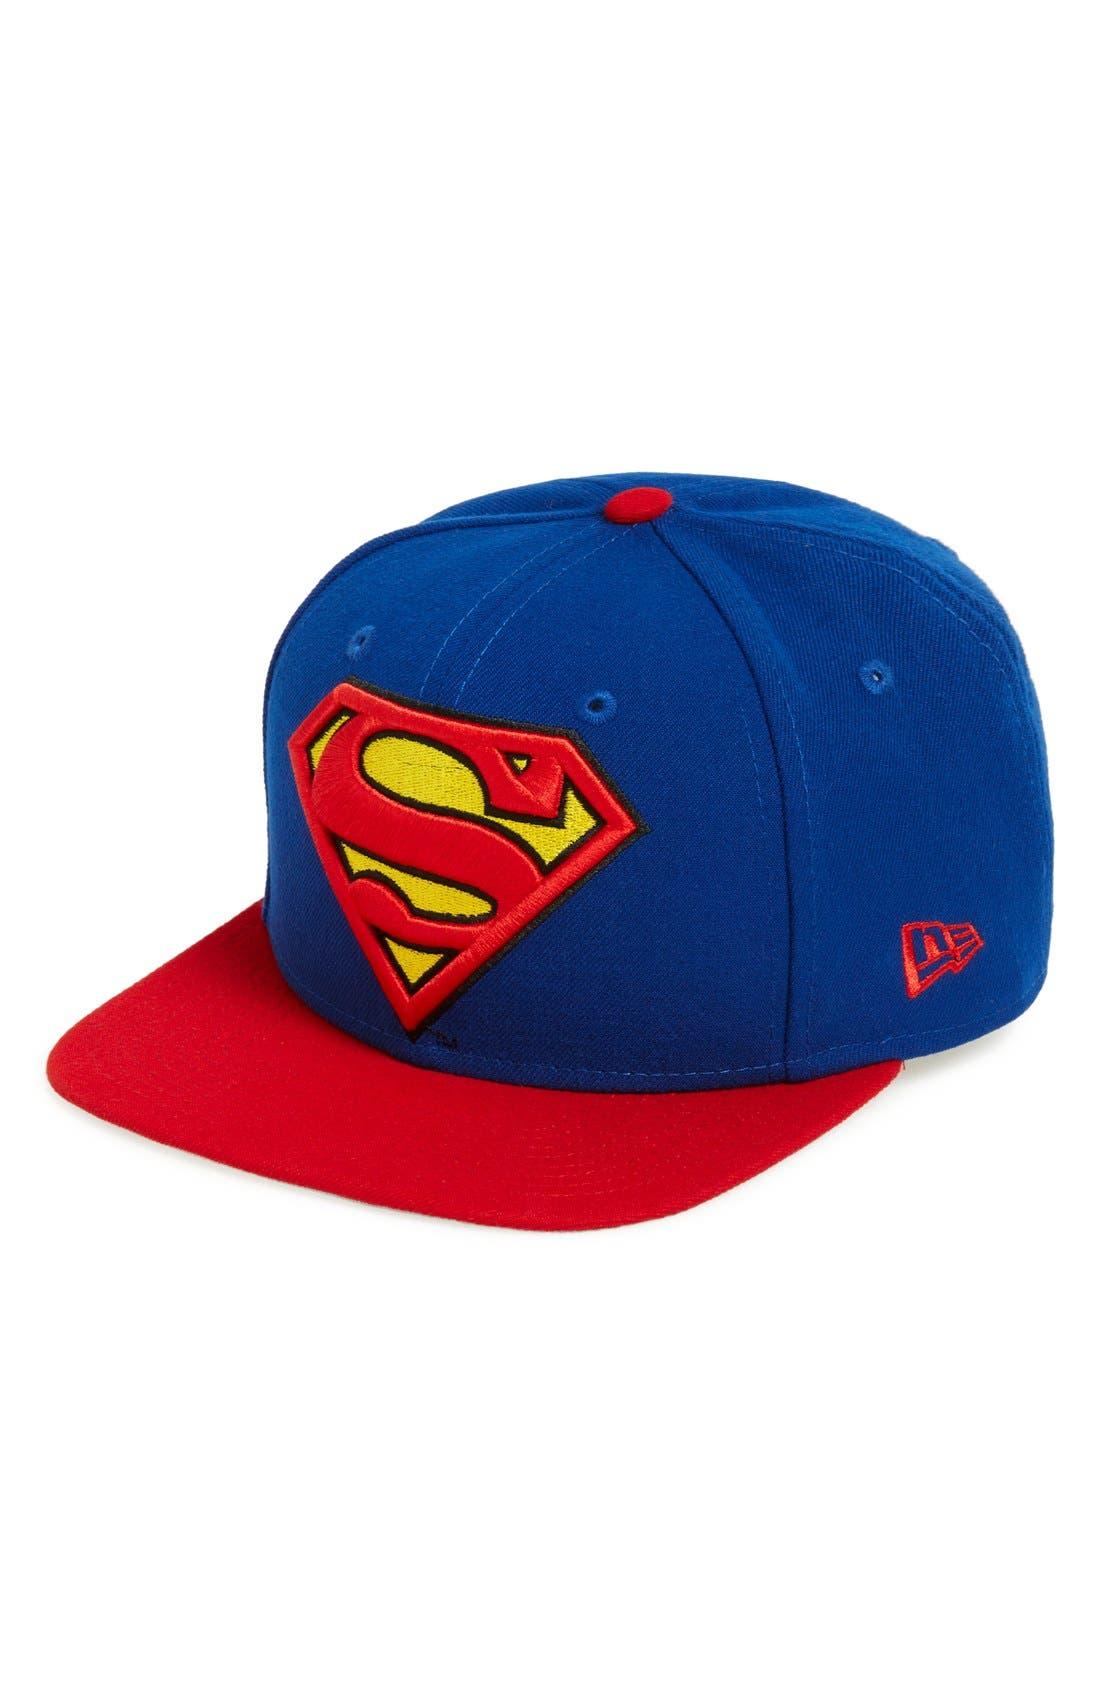 Alternate Image 1 Selected - New Era Cap 'Superman' Snapback Cap